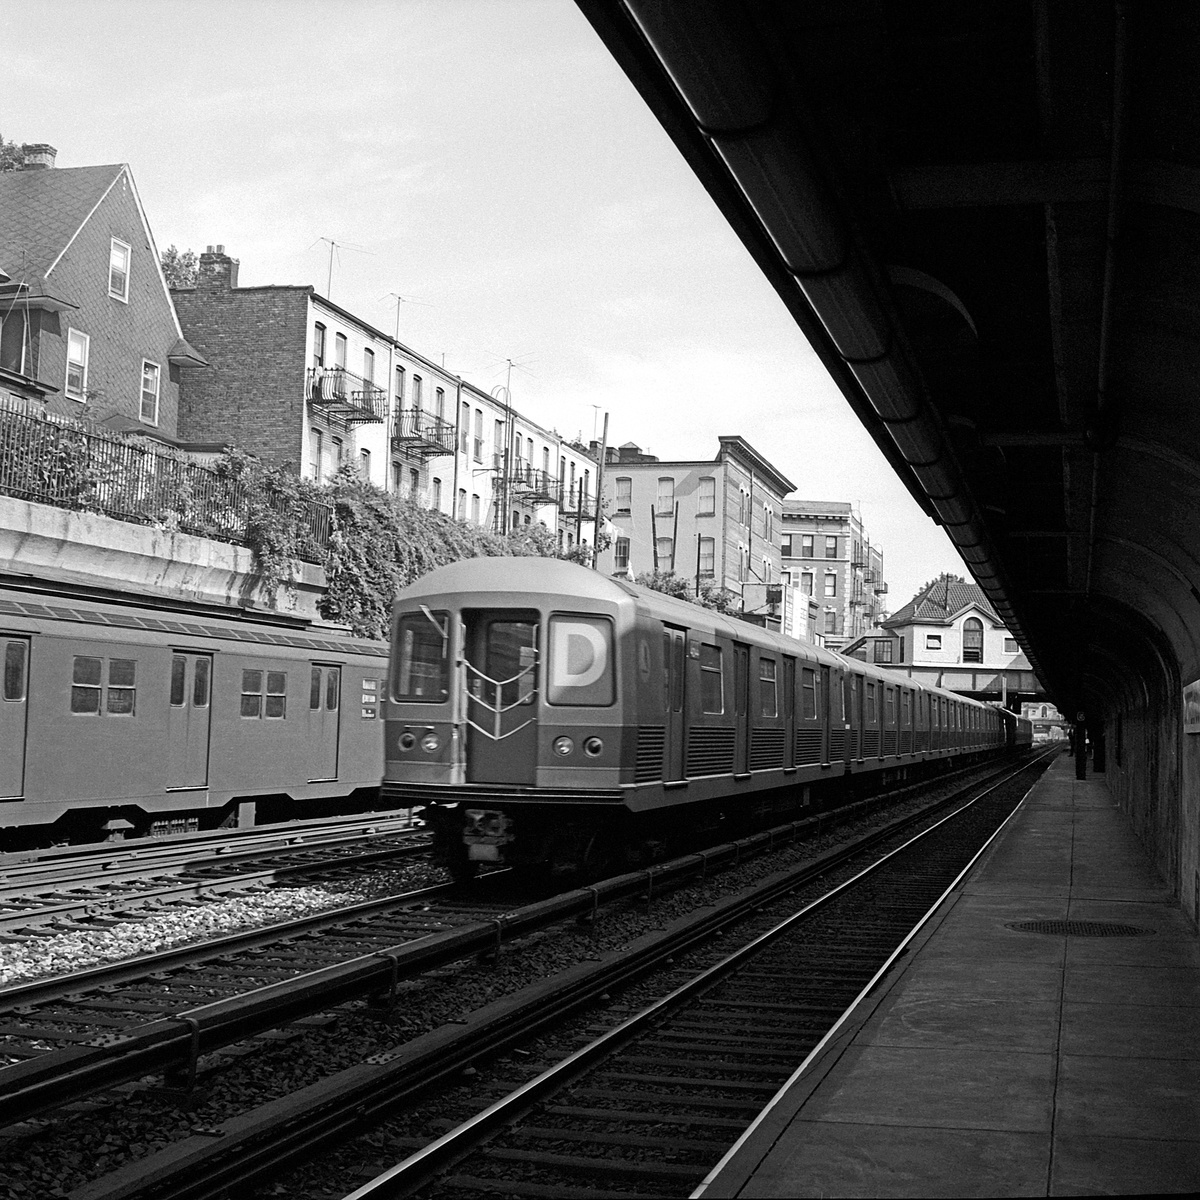 (588k, 1200x1200)<br><b>Country:</b> United States<br><b>City:</b> New York<br><b>System:</b> New York City Transit<br><b>Line:</b> BMT Brighton Line<br><b>Location:</b> Cortelyou Road<br><b>Route:</b> D<br><b>Car:</b> R-42 (St. Louis, 1969-1970)  <br><b>Collection of:</b> David Pirmann<br><b>Date:</b> 7/8/1969<br><b>Viewed (this week/total):</b> 3 / 280